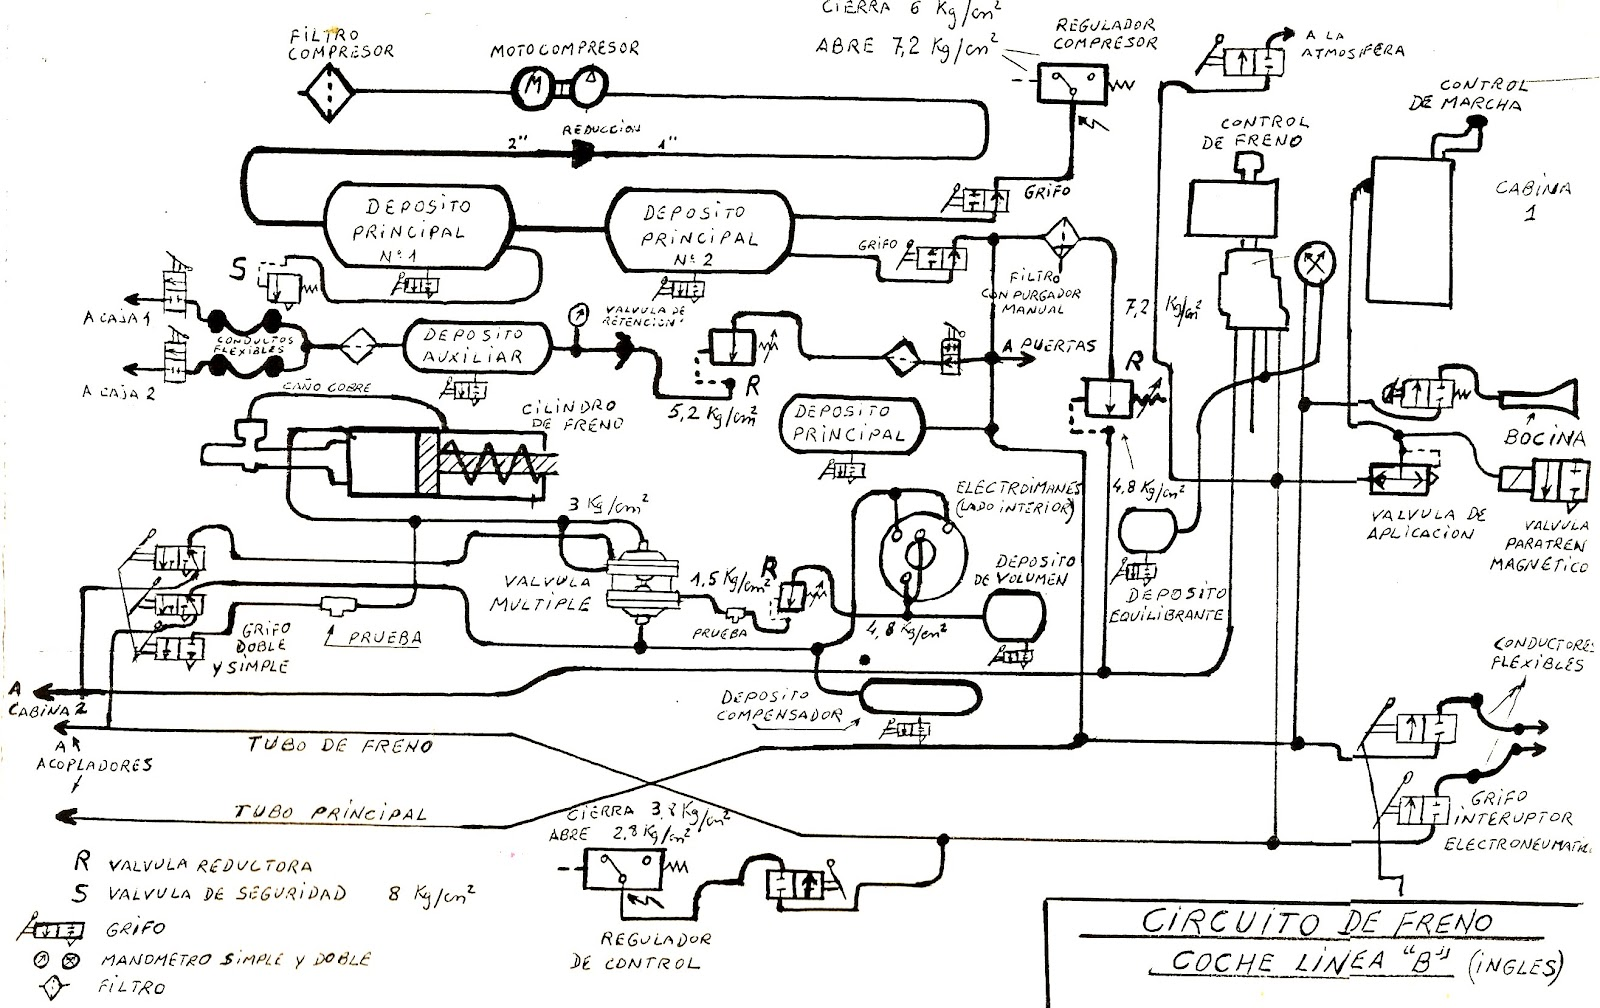 planos del equipo de frenos  u0026quot coche siemens u0026quot